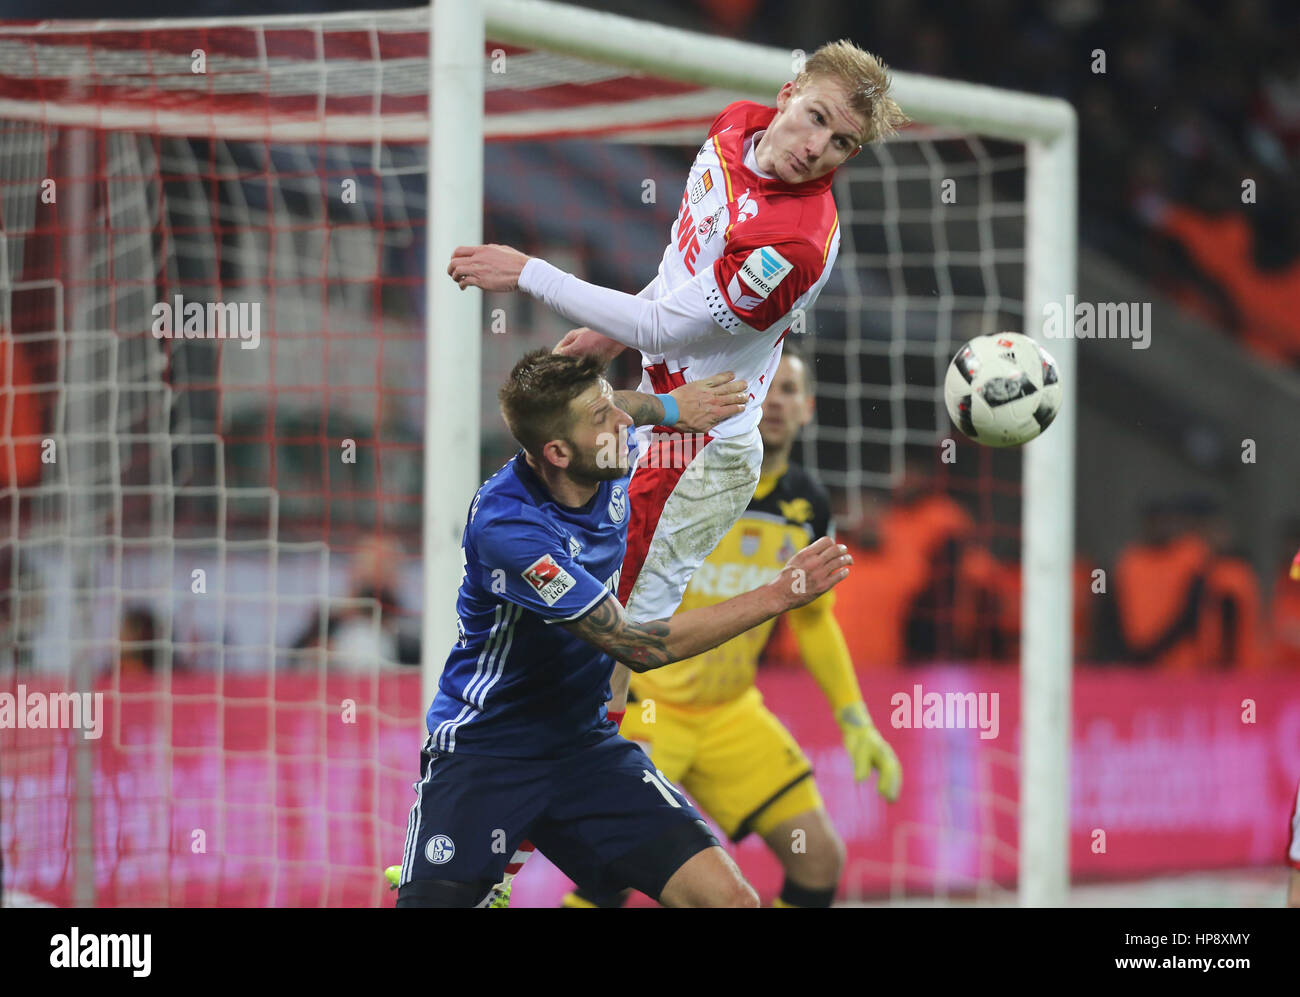 Cologne, Germany, February 19, 2017, Bundesliga matchday 21, 1. FC Koeln - FC Schalke 04:  Tackling Guido Burgstaller - Stock Image